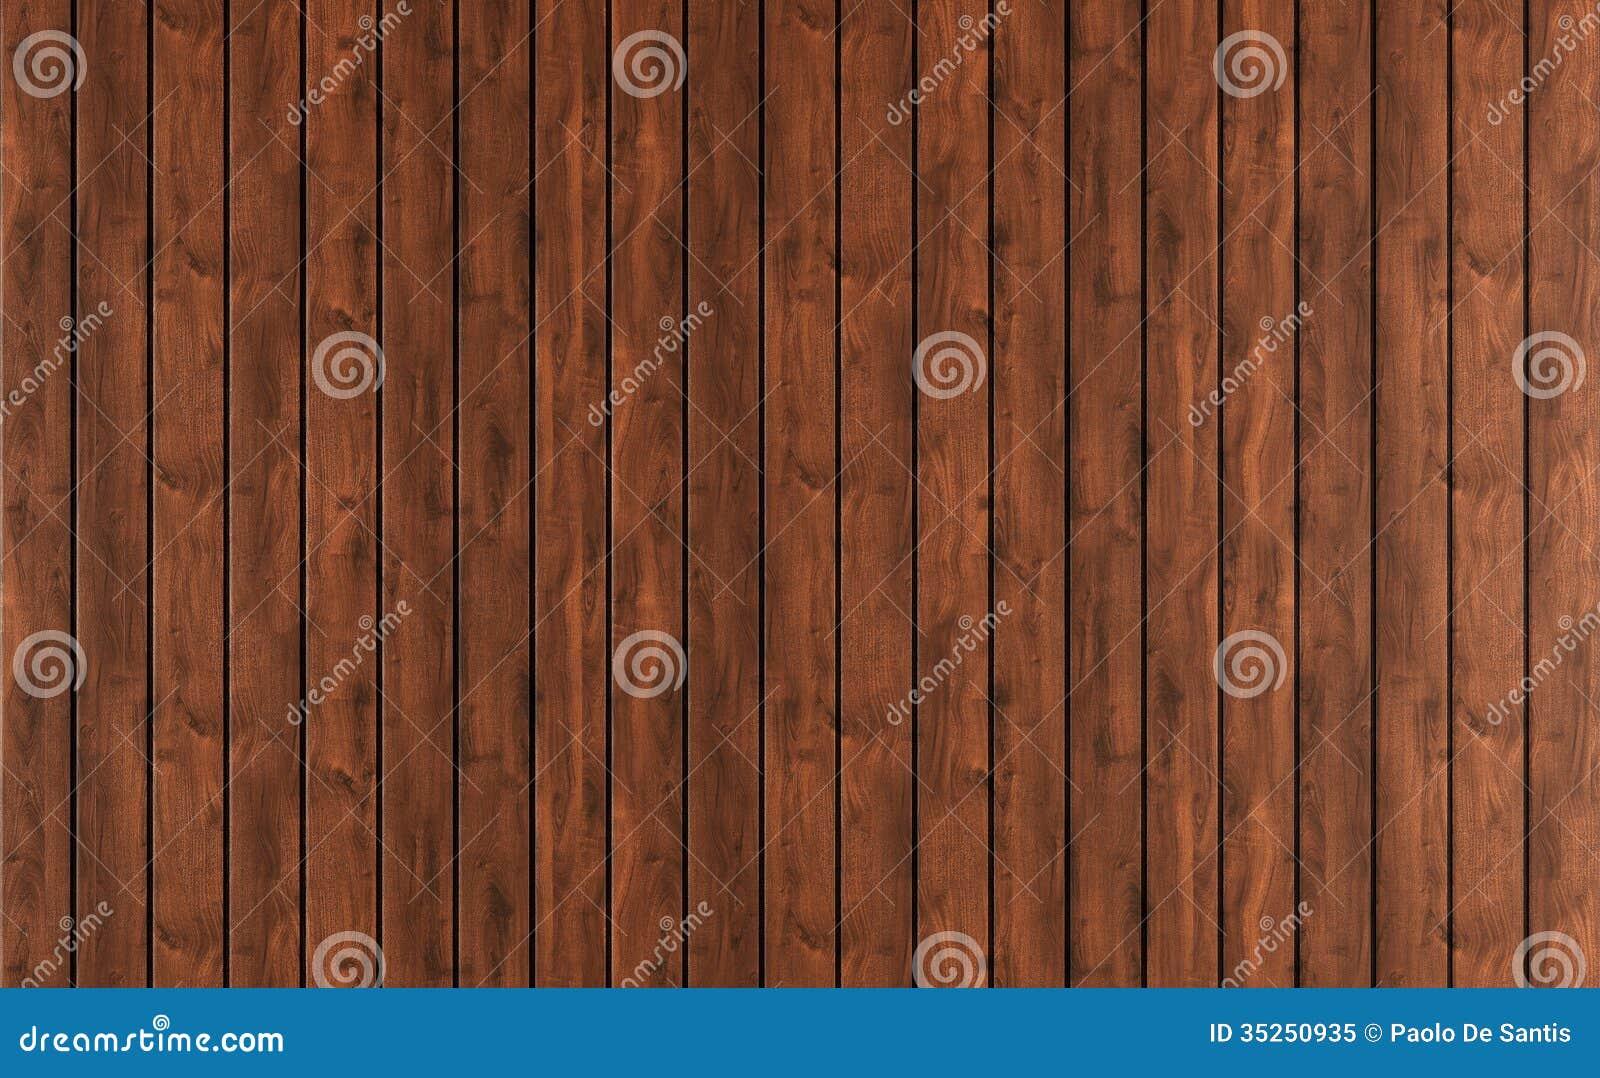 Dark wood paneling stock illustration of